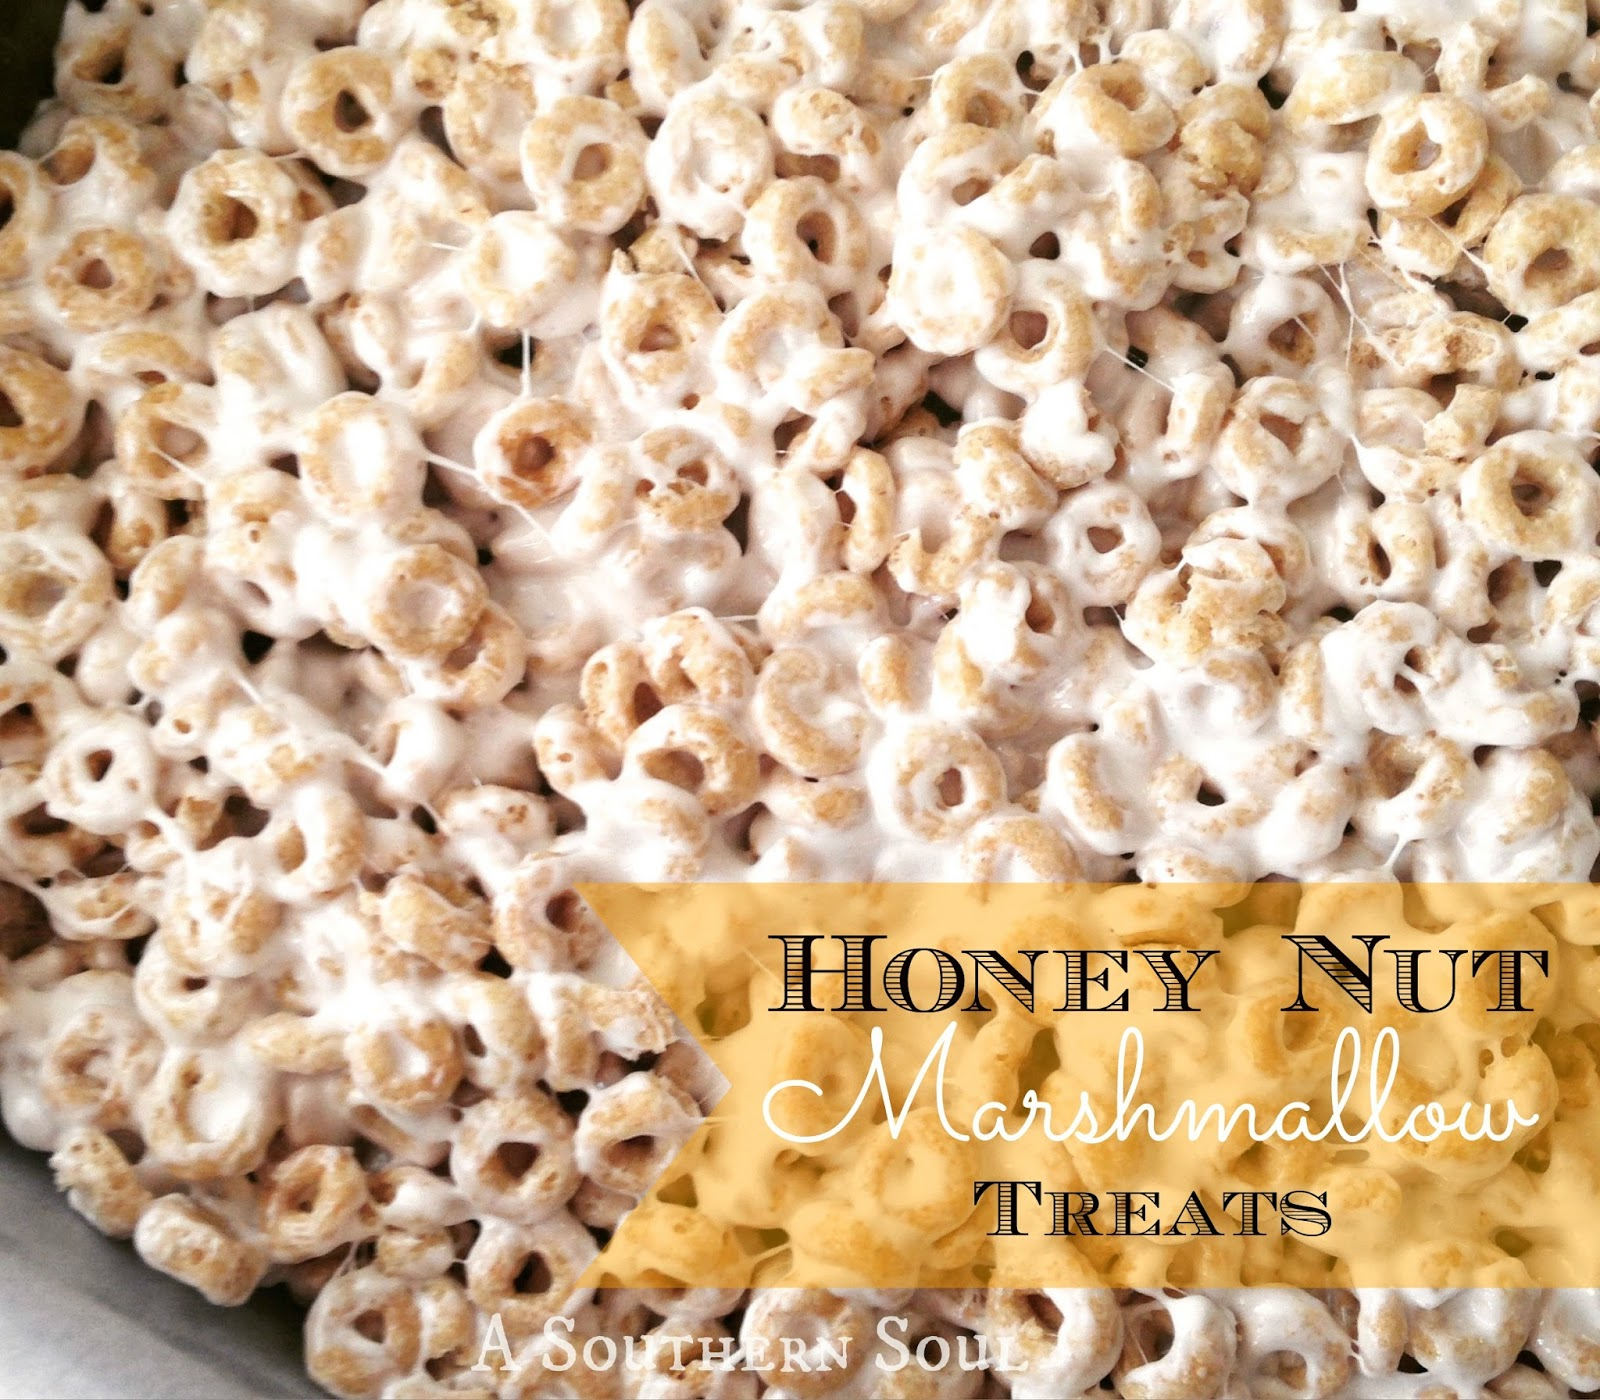 Honey Nut Marshmallow Treats A Southern Soul